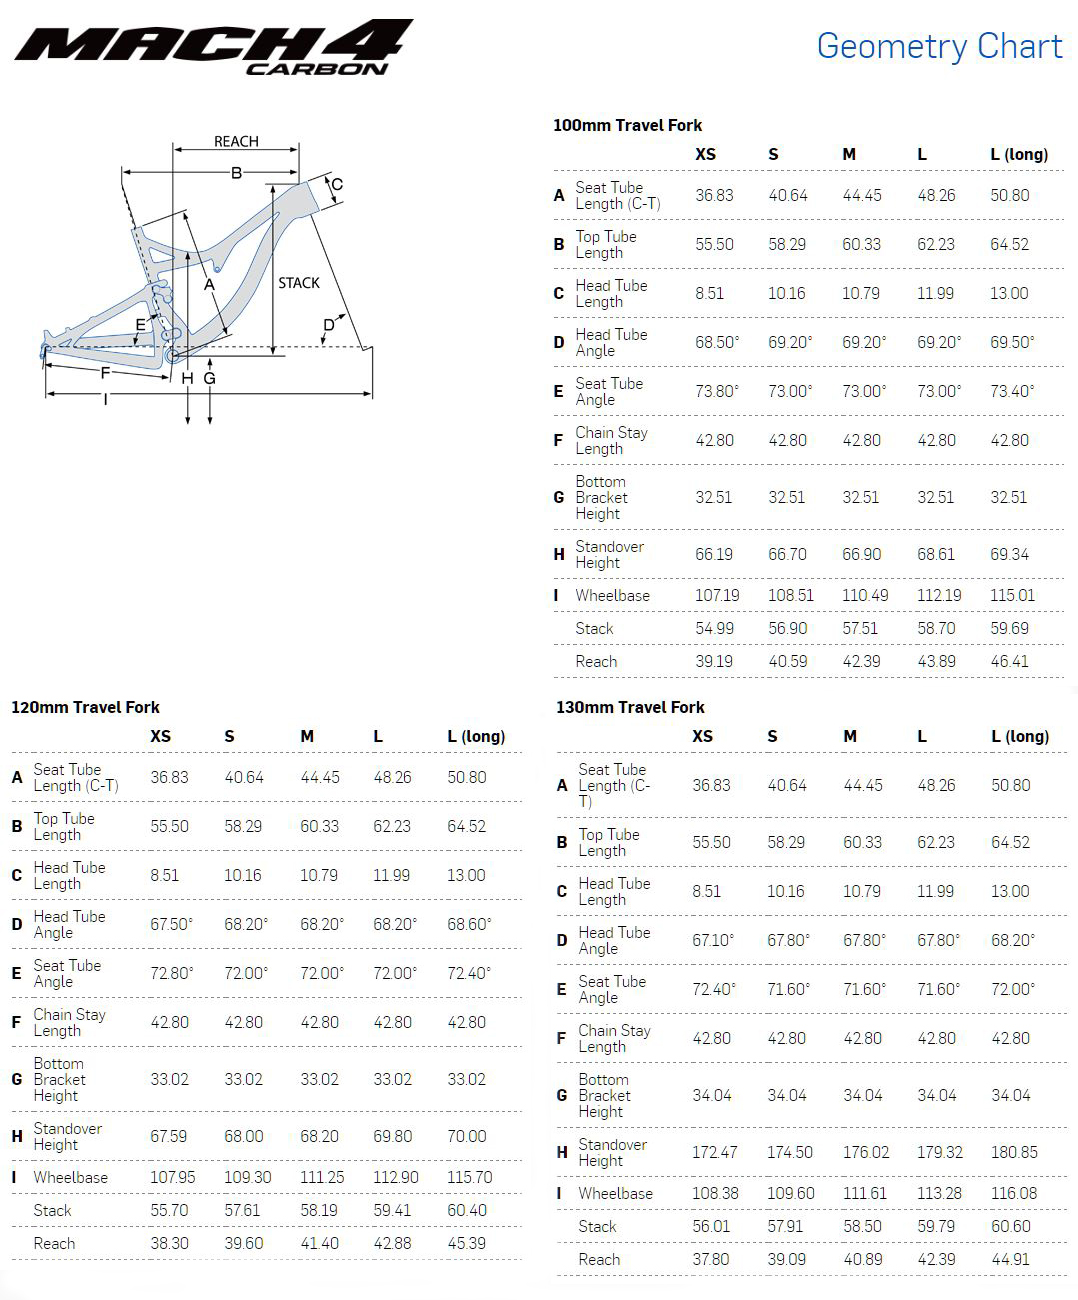 Pivot Mach 4 Carbon geometry chart